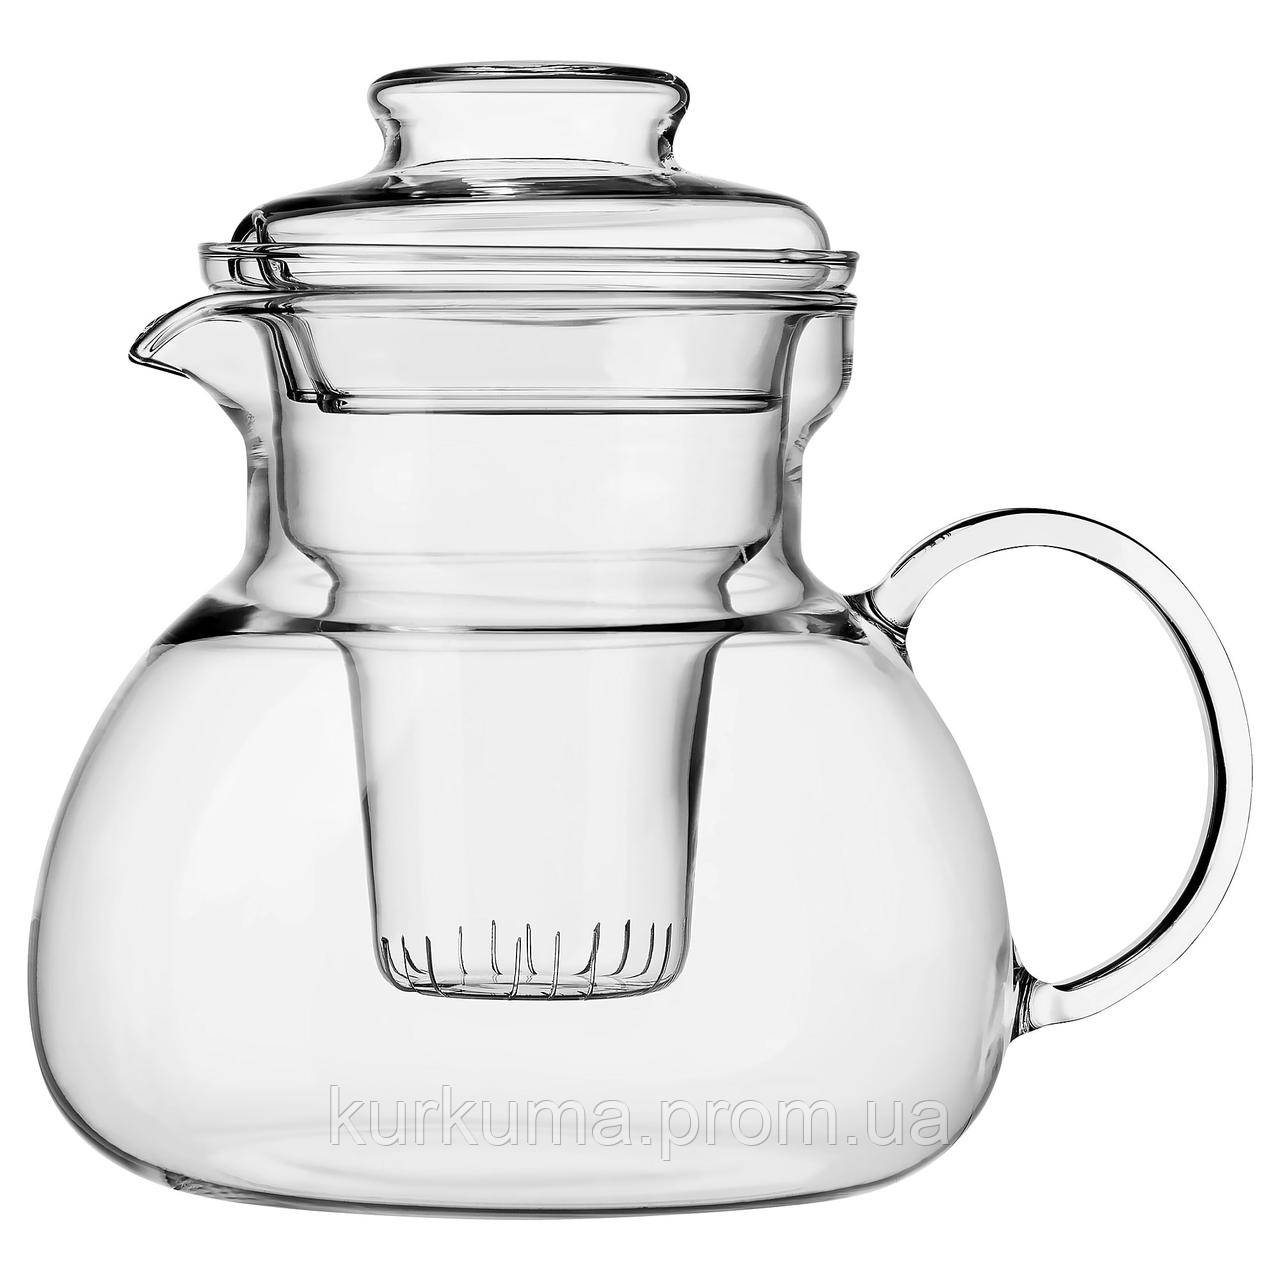 IKEA LERGODS Чайник, прозрачное стекло  (404.161.96)